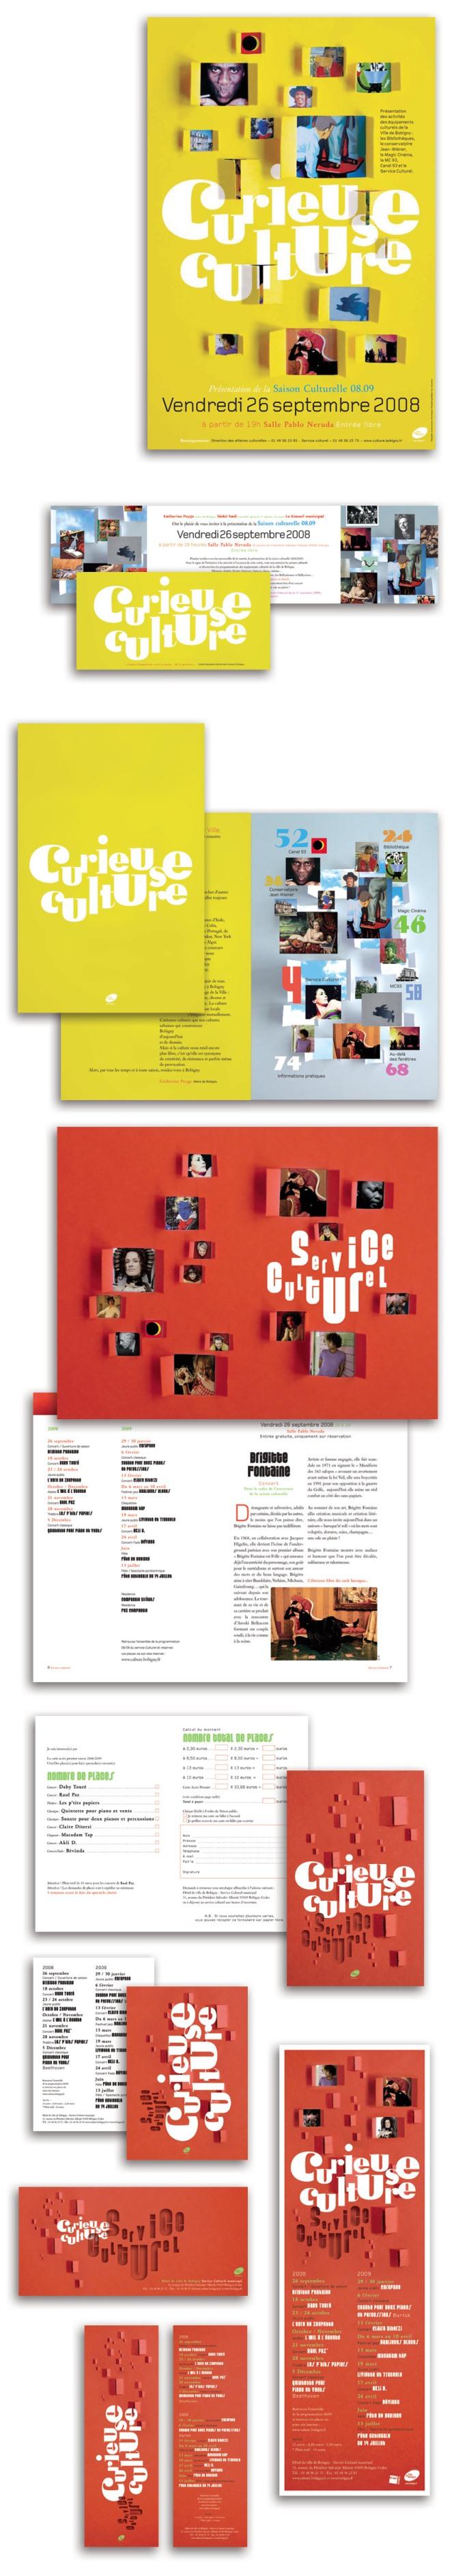 Affiche 80 x 120 • Invitation • Programme 90 pages 130 x 200 • Papeterie • Cartes • Annonce presse